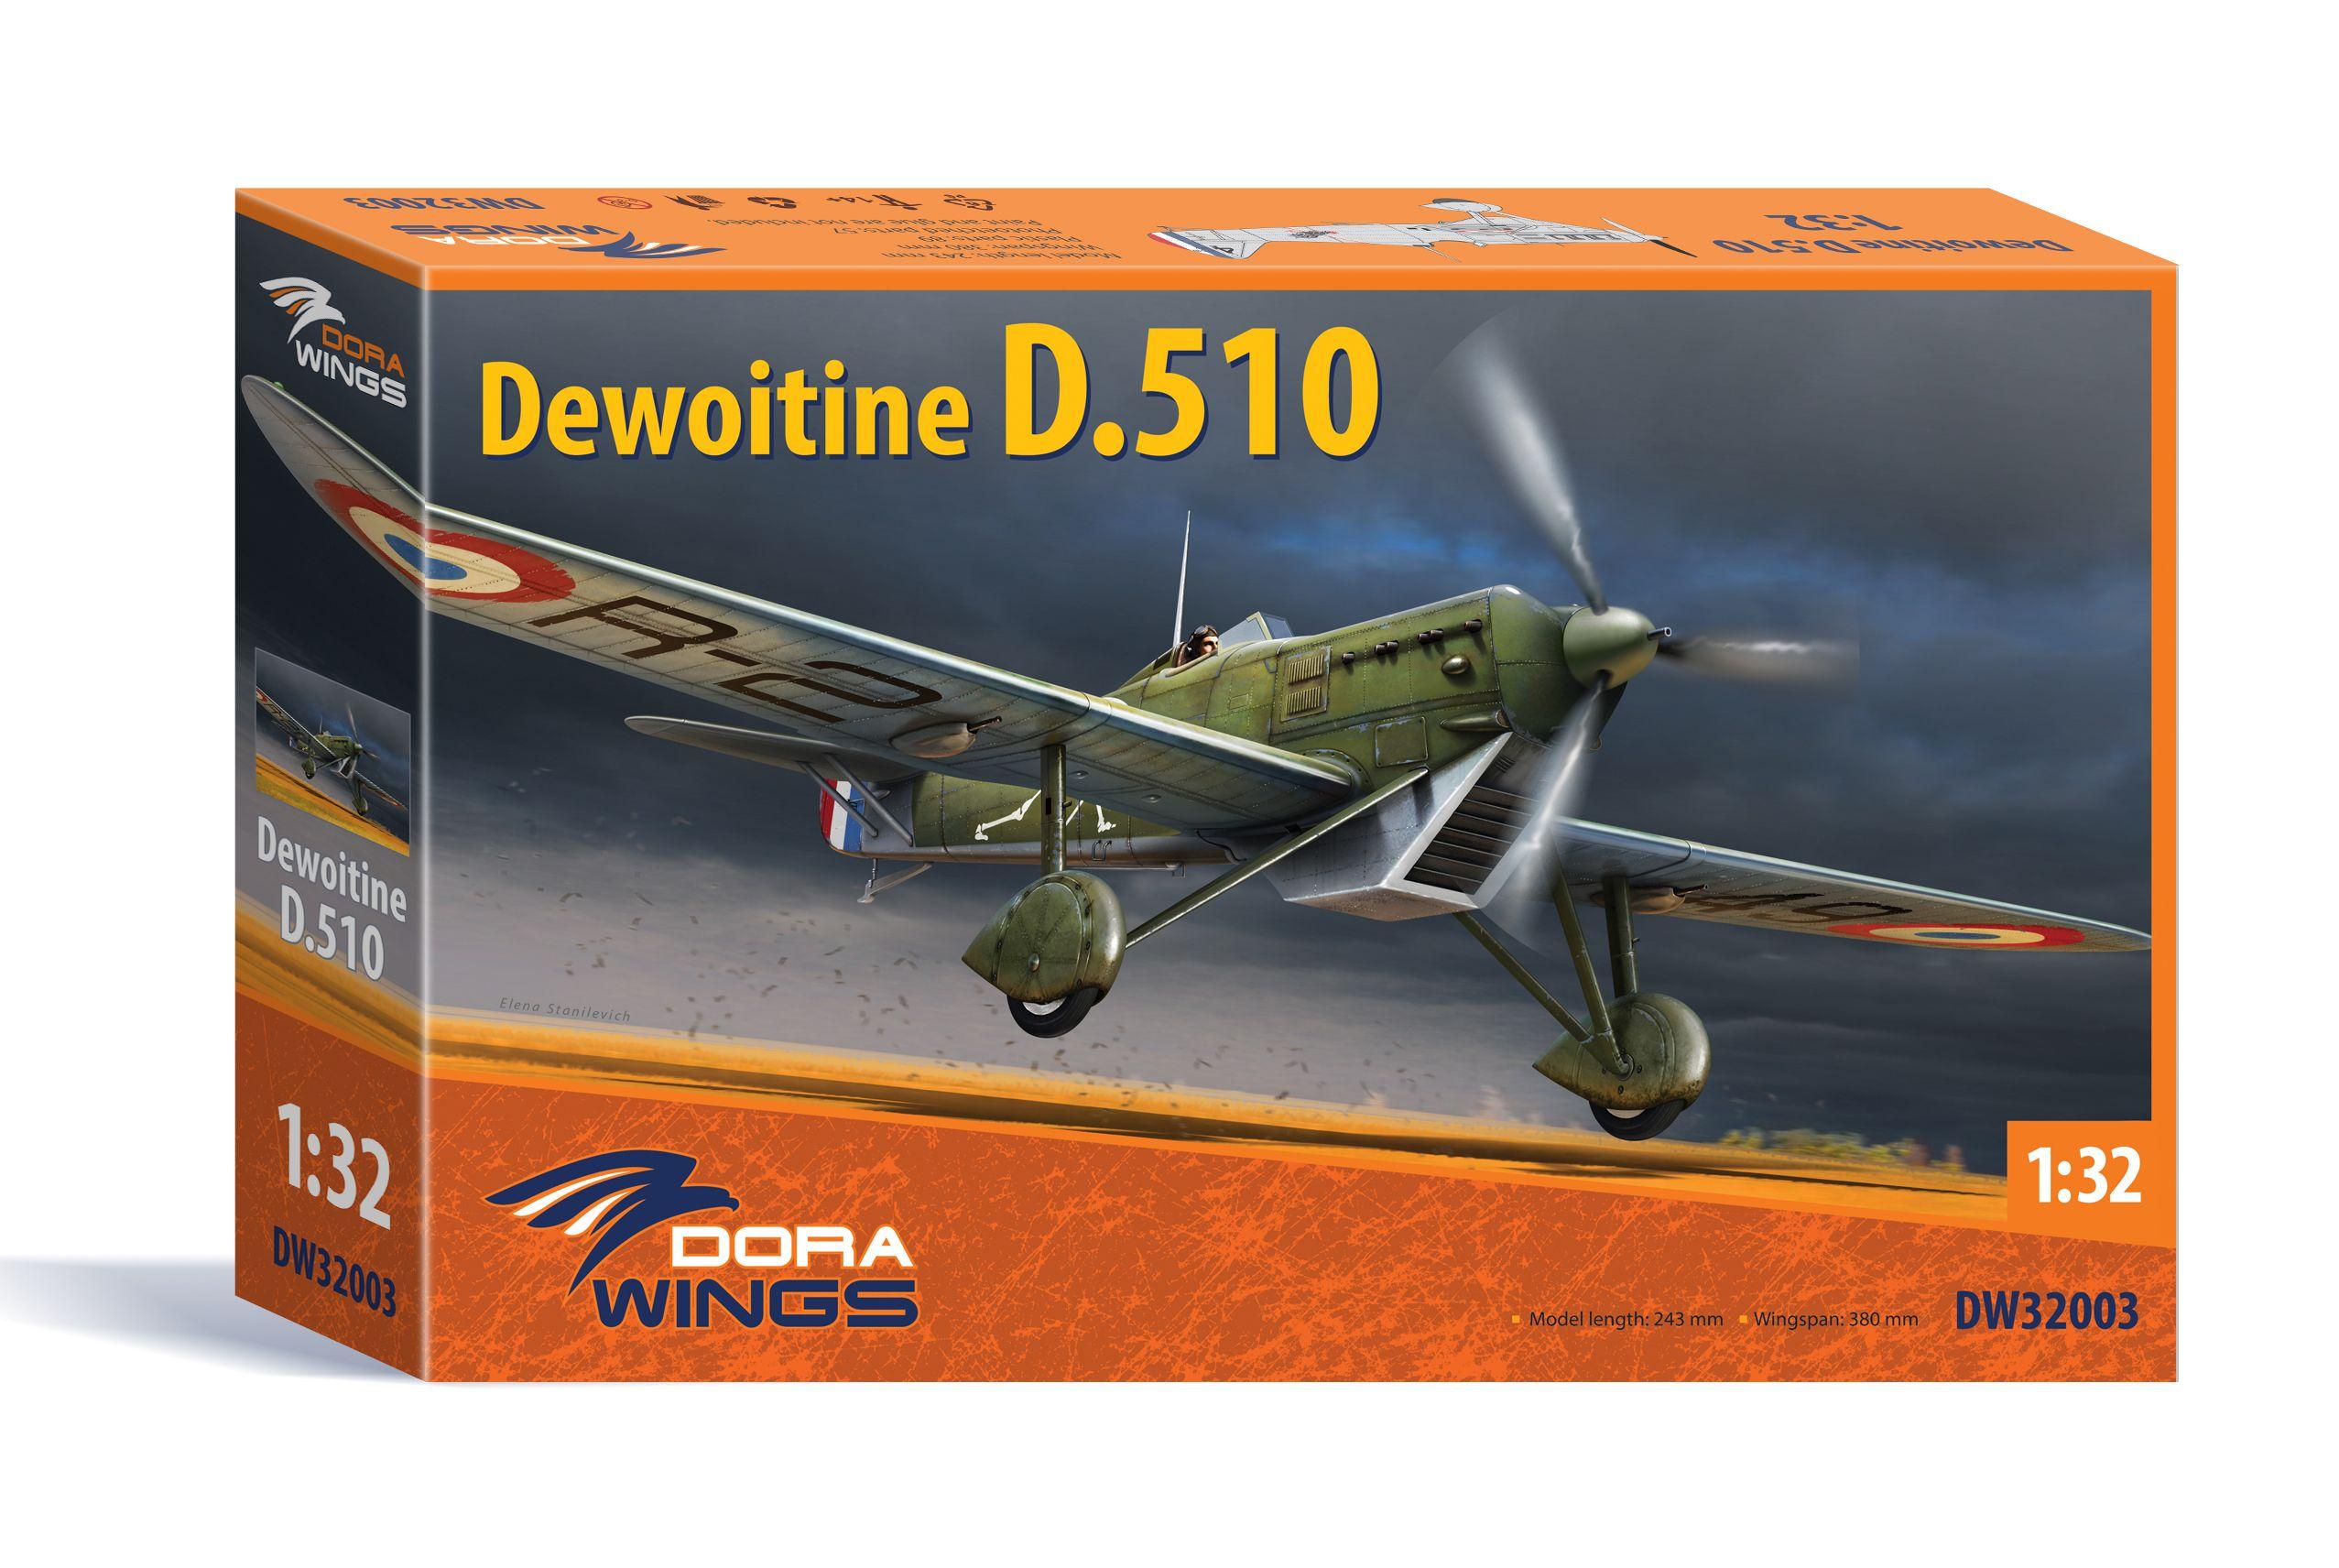 Dora Wings 1/32 Scale Dewoitine D.510